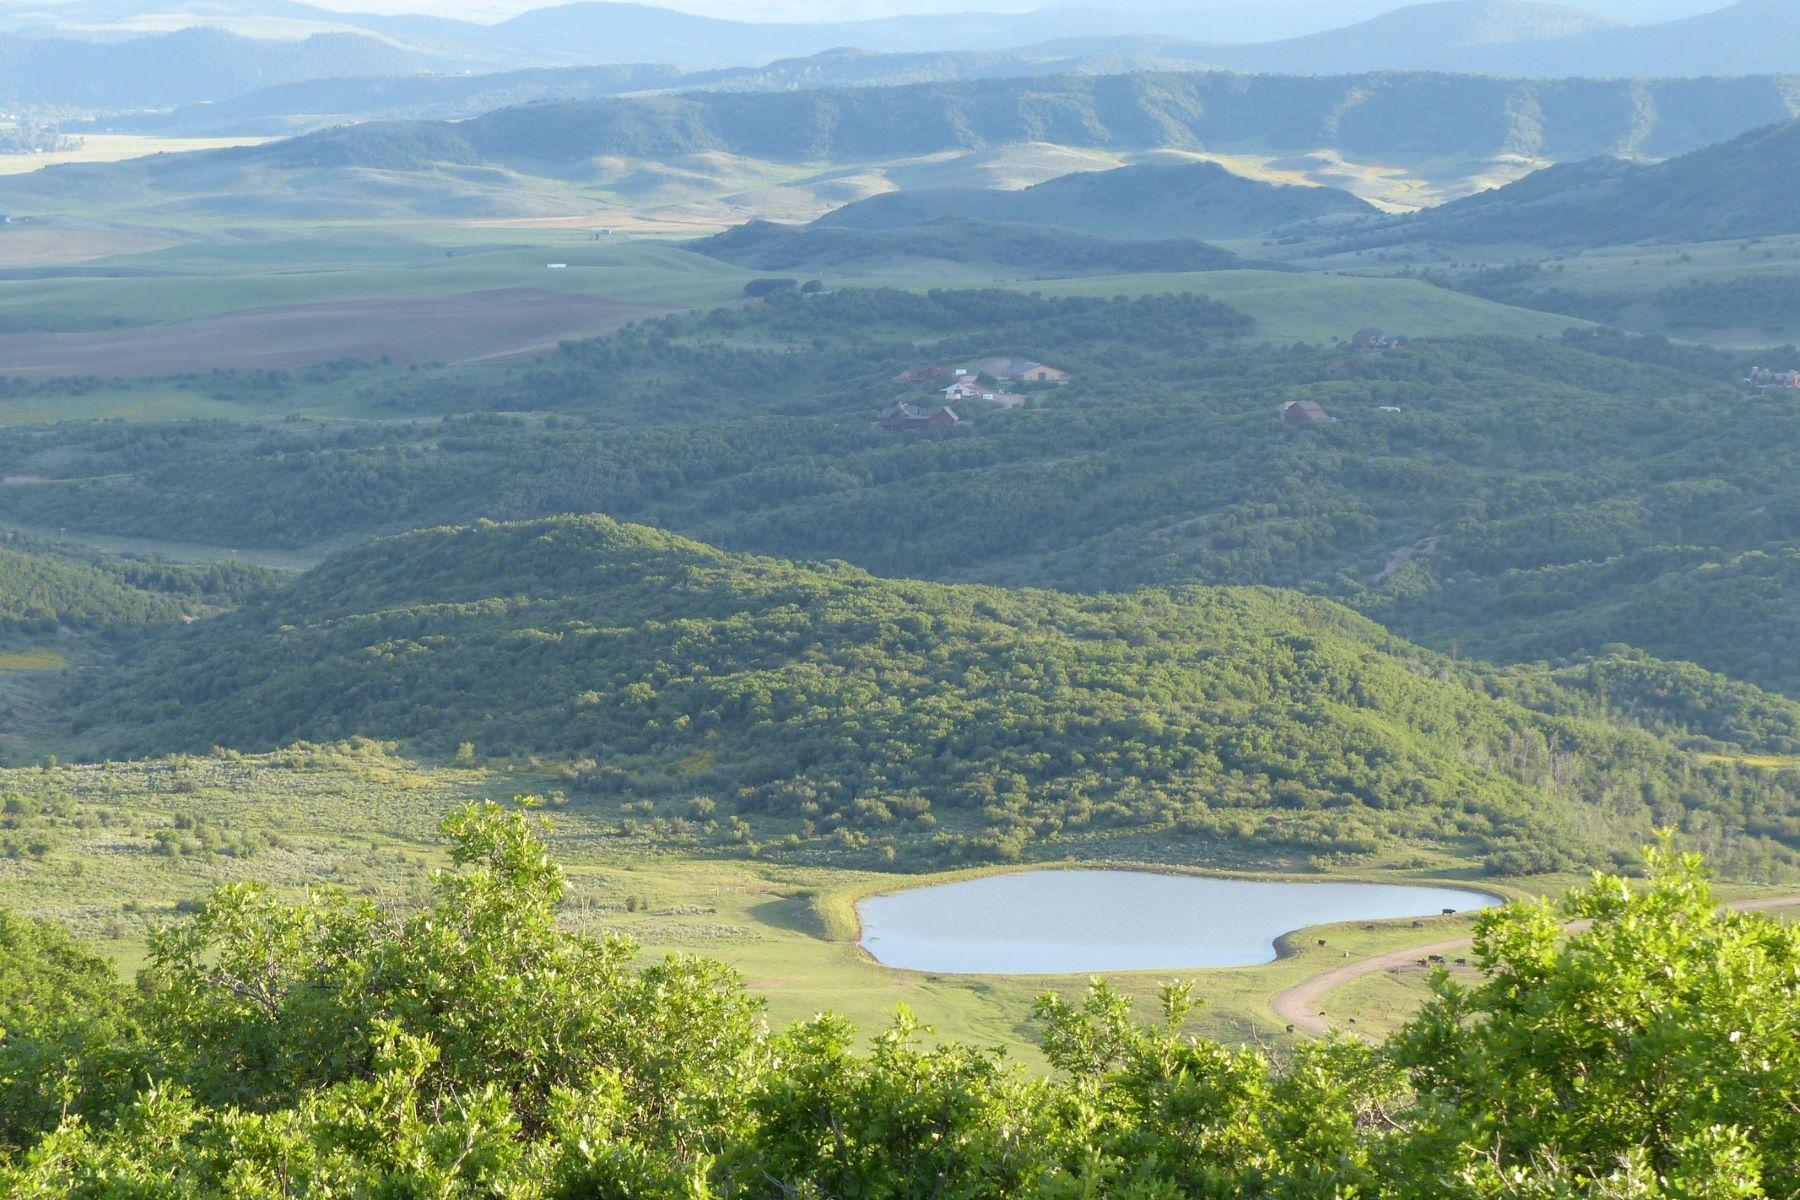 Land for Sale at Four Seasons Preserve at Elk Mtn 45233 Four Seasons Way Lot 10, Four Seasons Preserve at Elk Mtn Steamboat Springs, Colorado 80487 United States